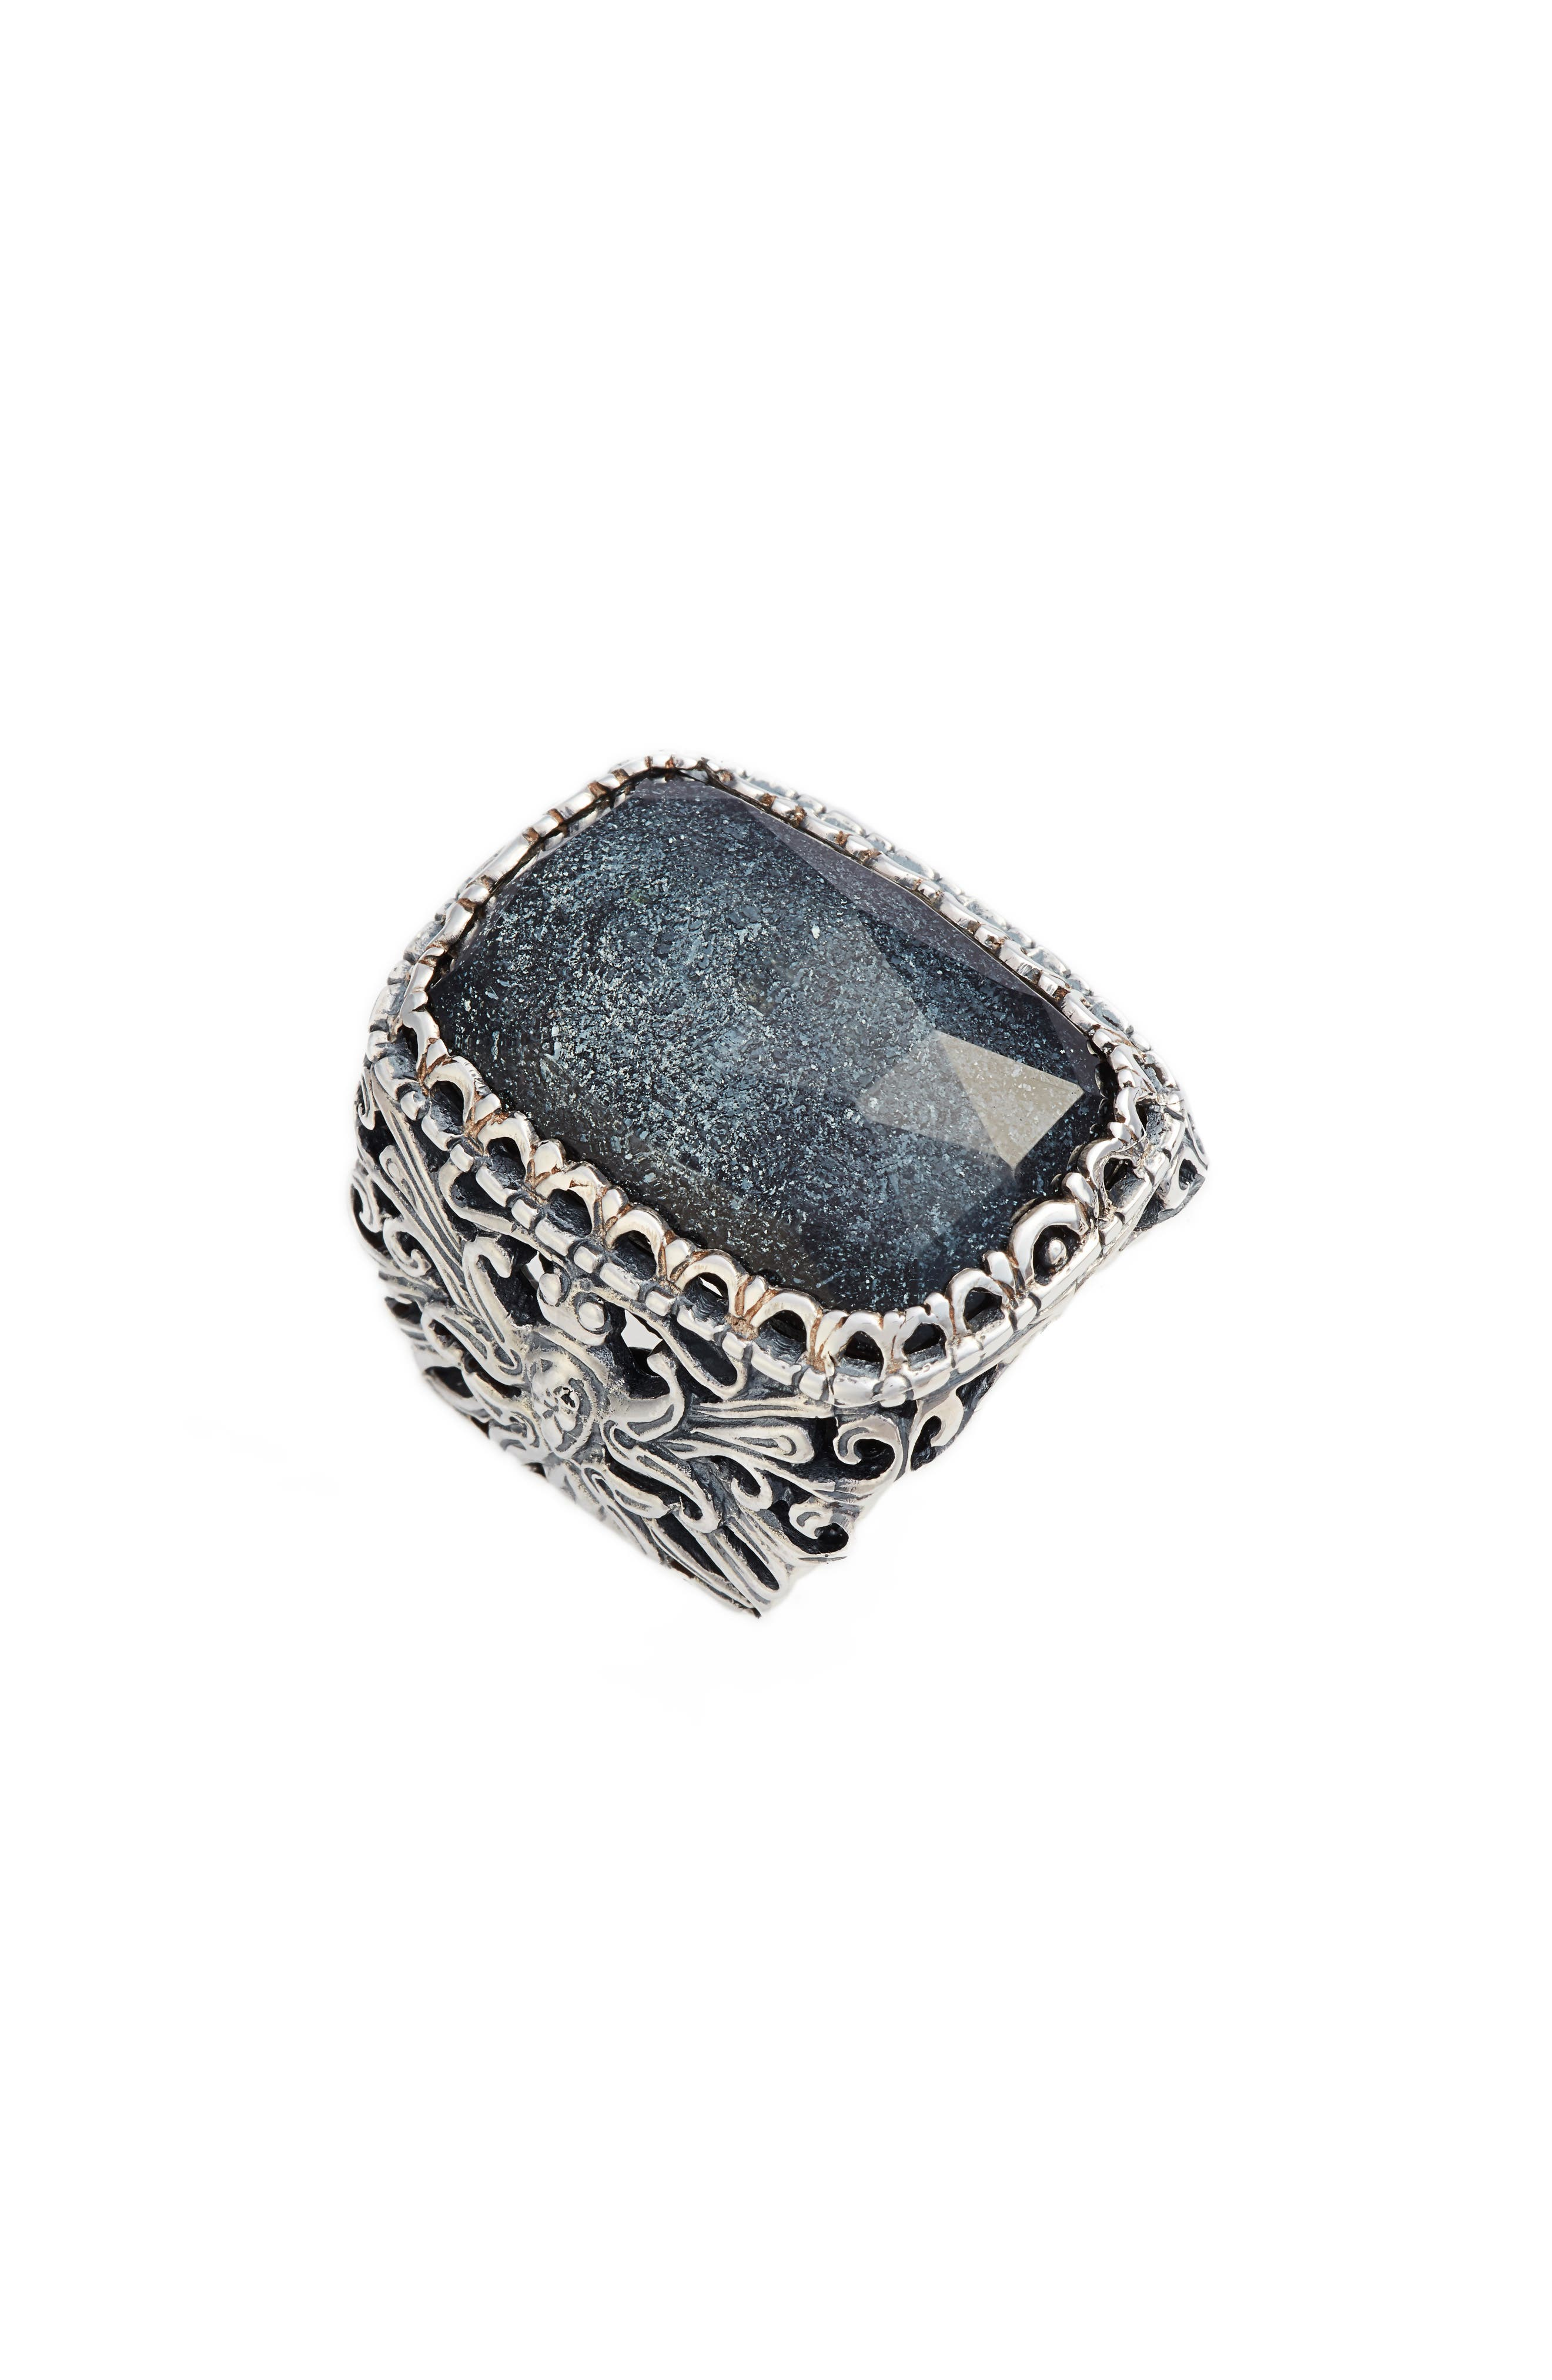 Santorini Hematite Ring,                         Main,                         color, Silver/ Hematite